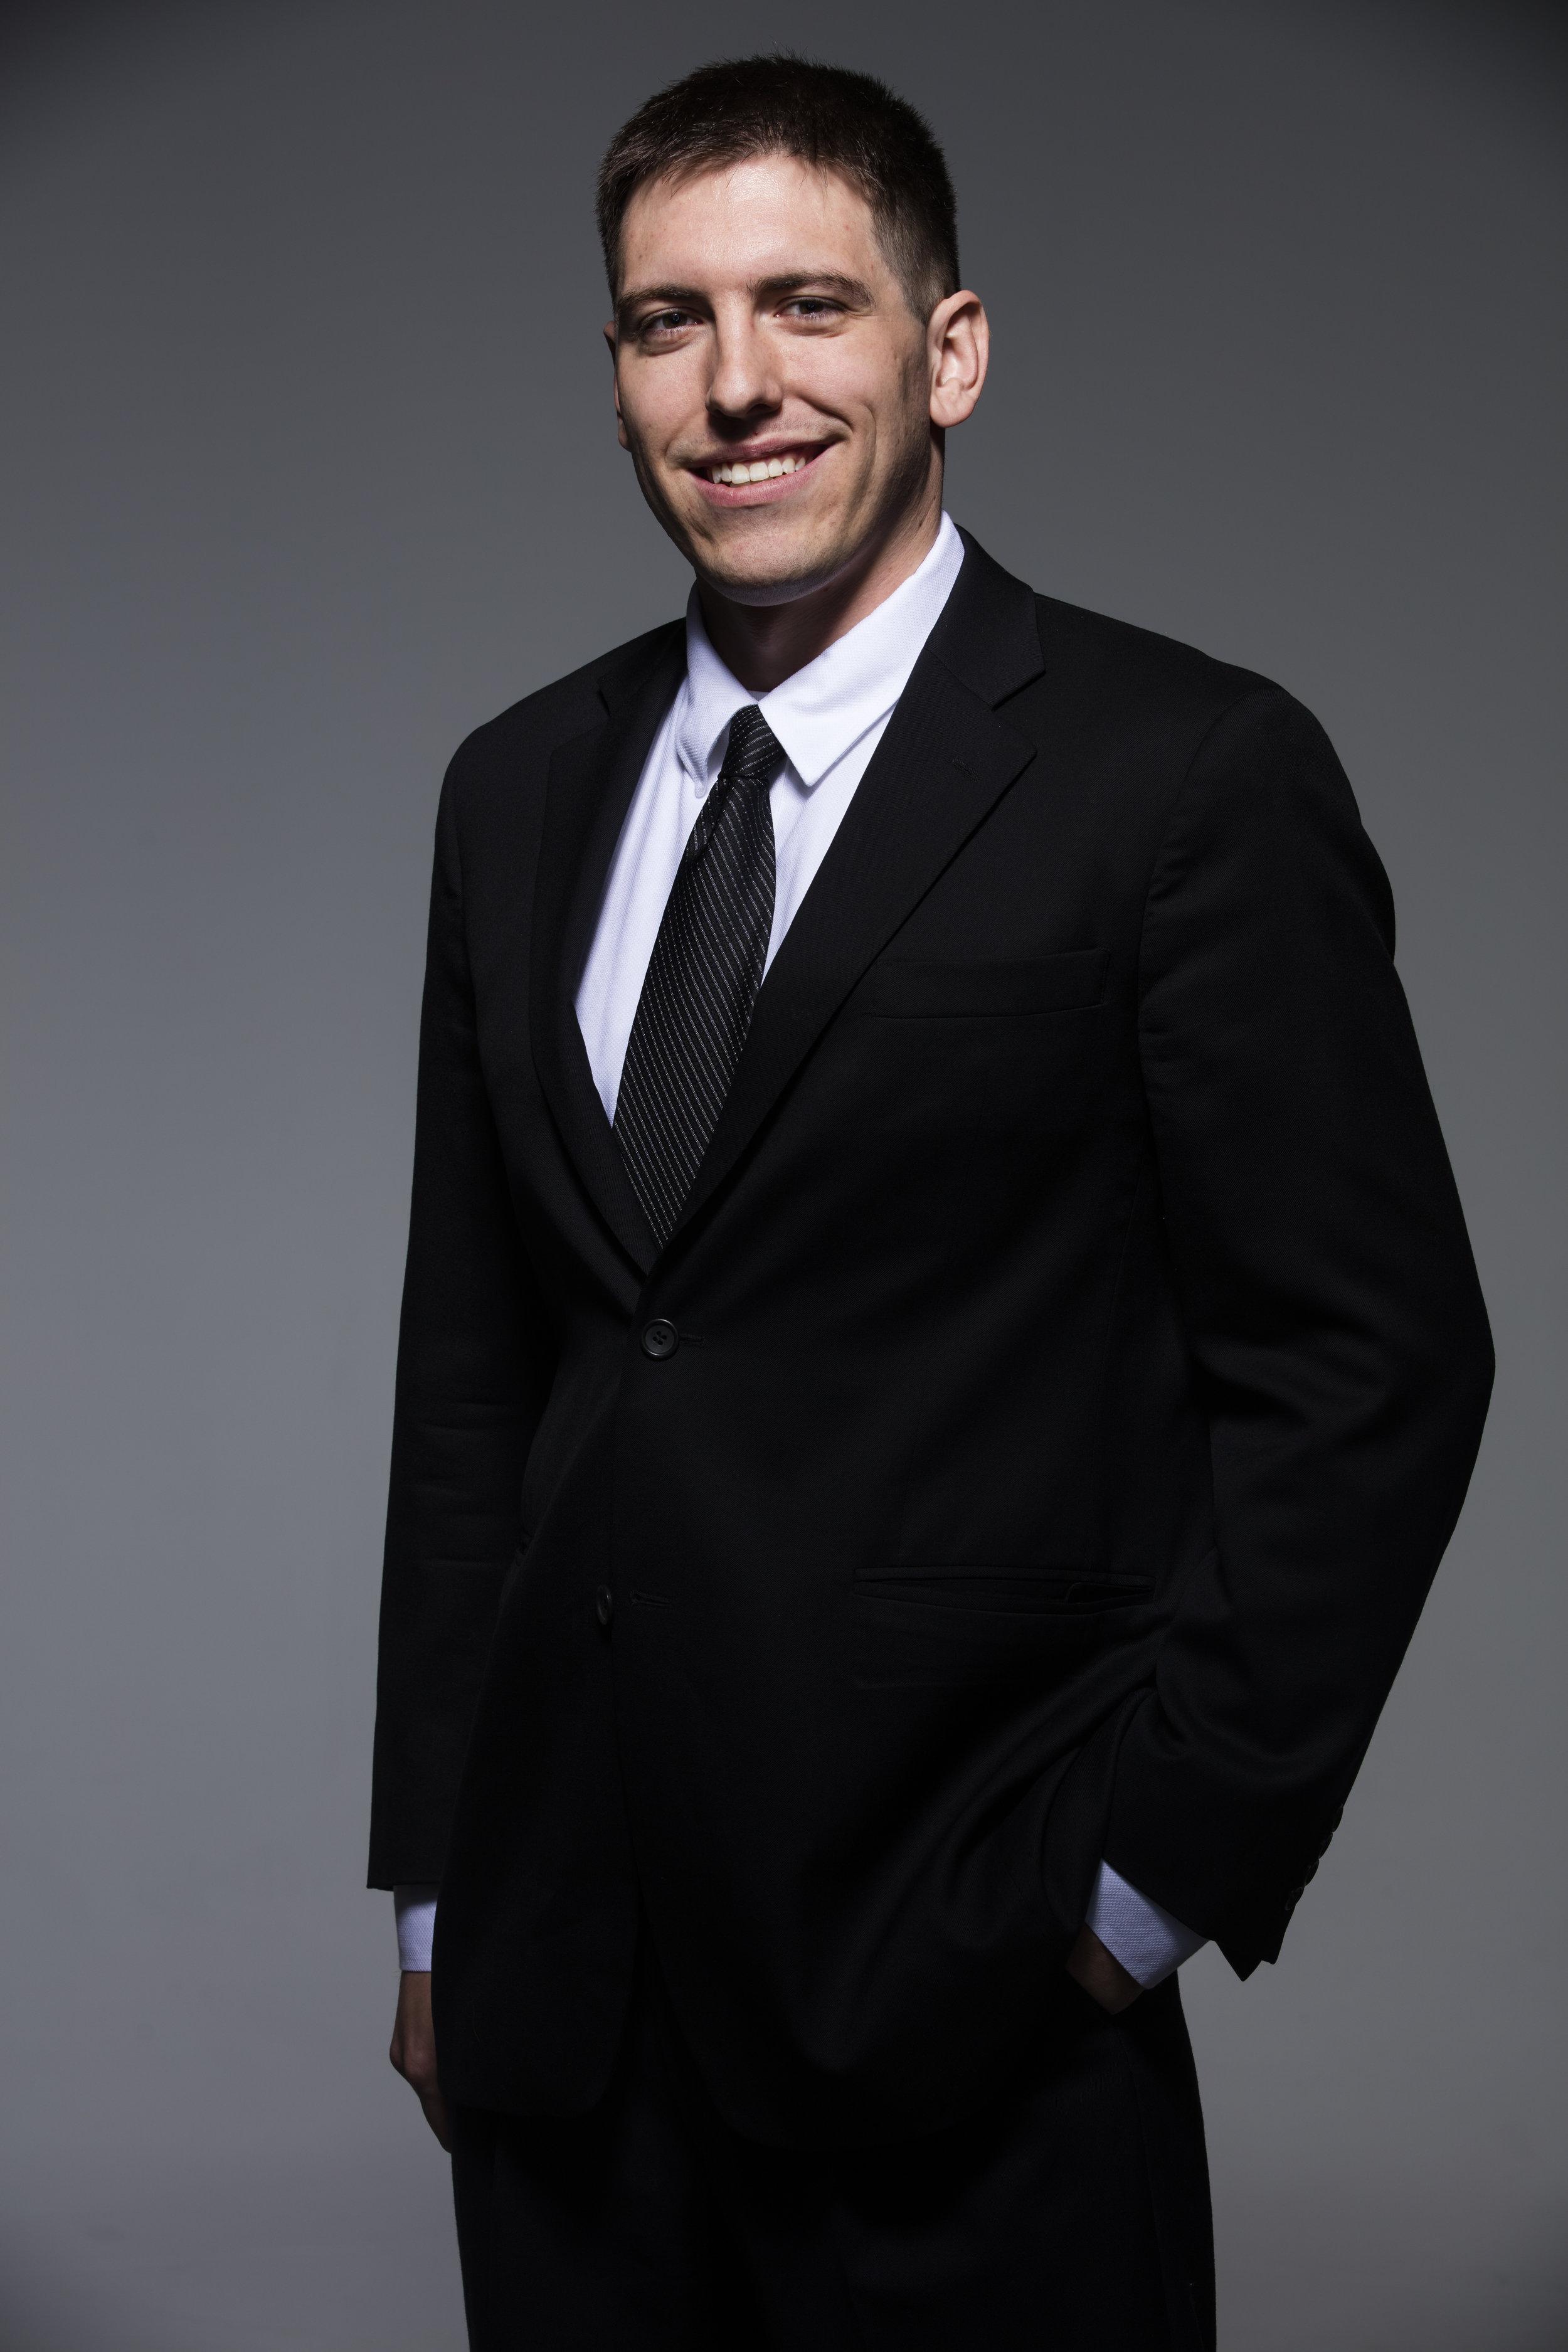 Steve Wood, Founder/CEO